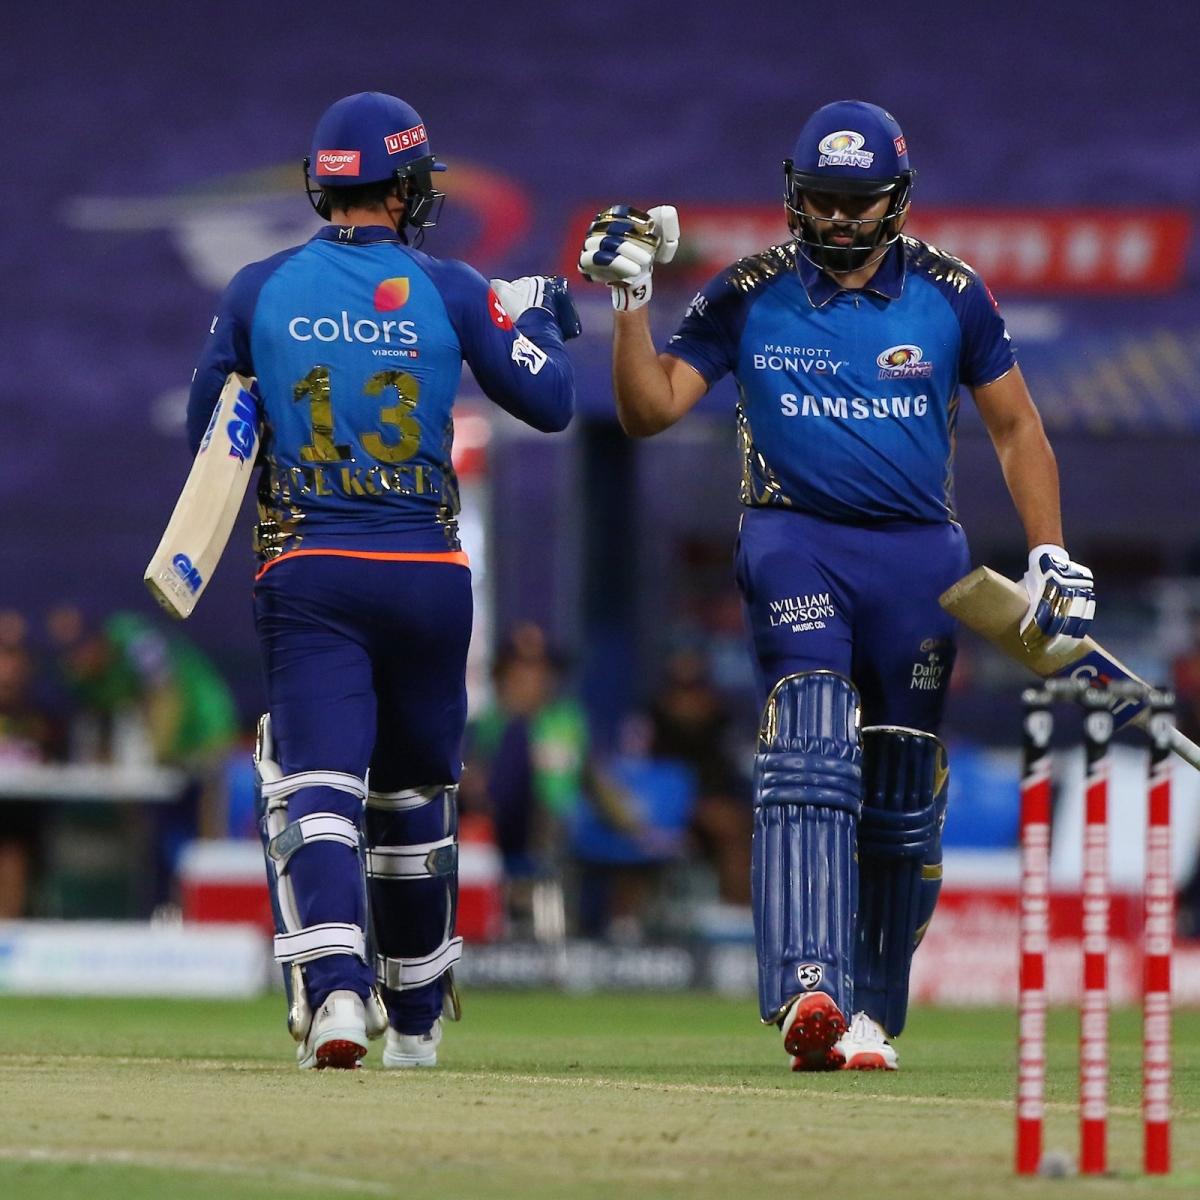 IPL 2020: Mumbai Indians extend win streak with 8-wicket victory over Kolkata Knight Riders